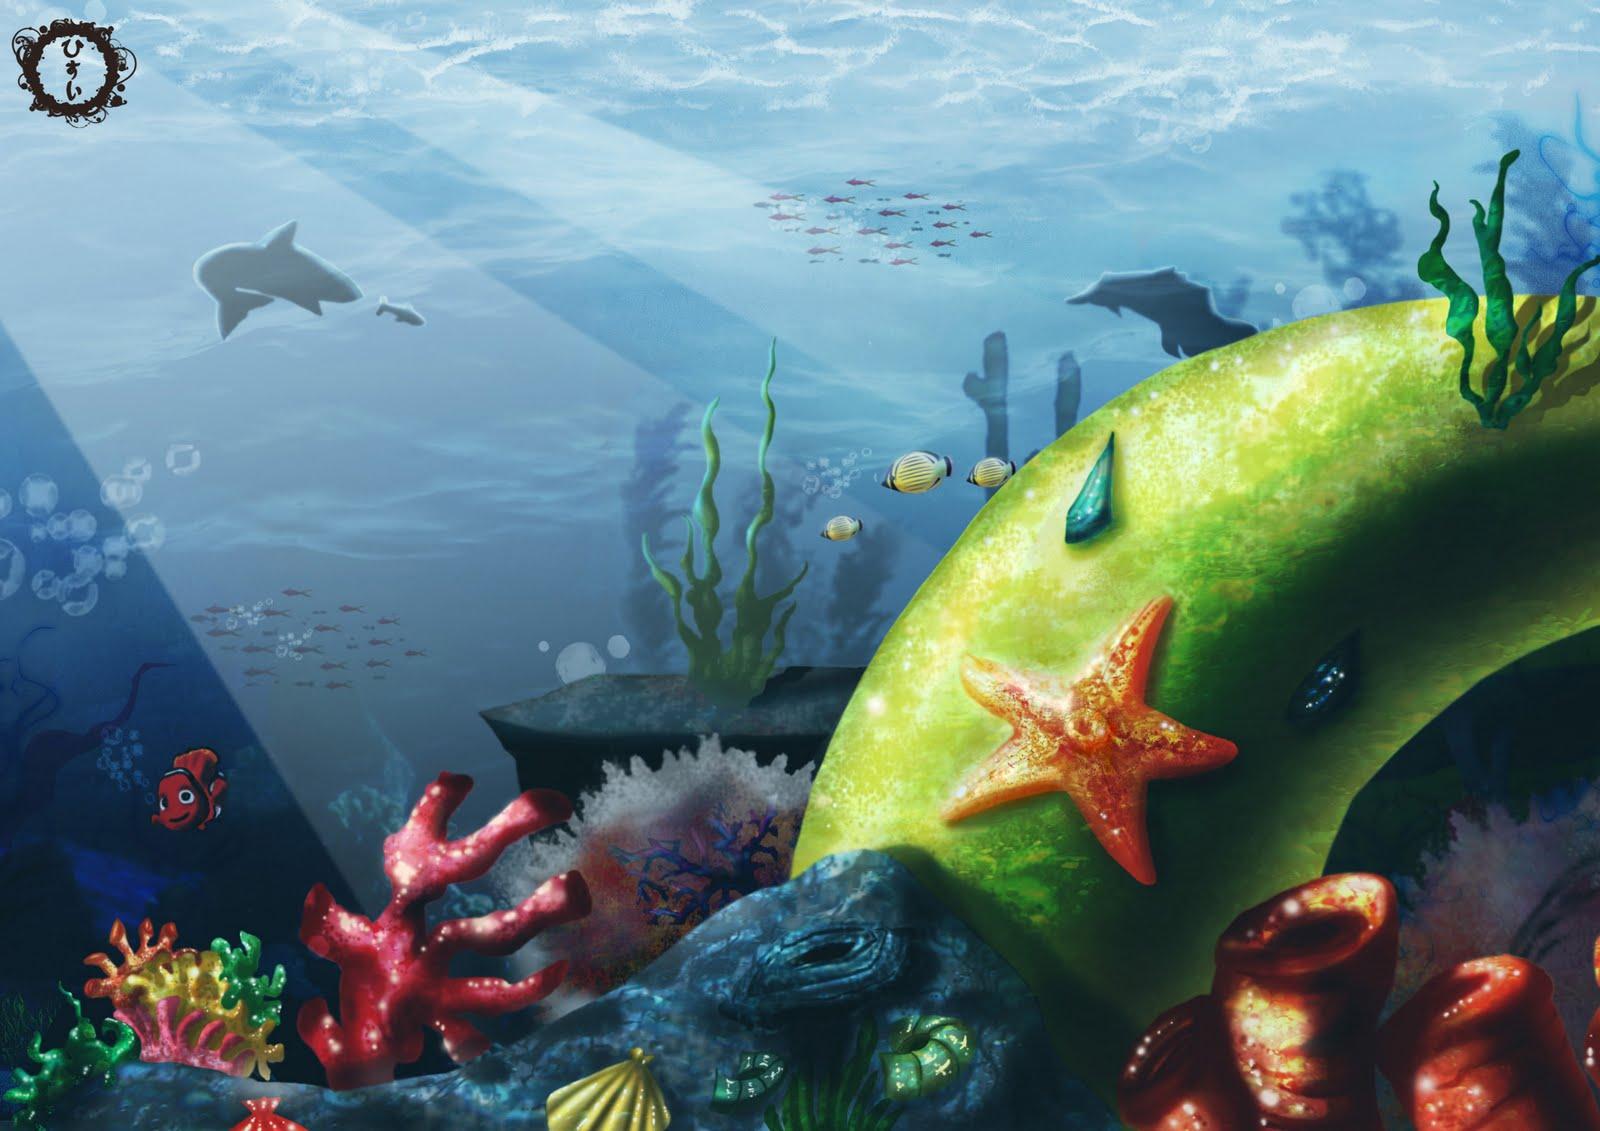 Sfondi fondali marini stelle for Sfondi pesci tropicali